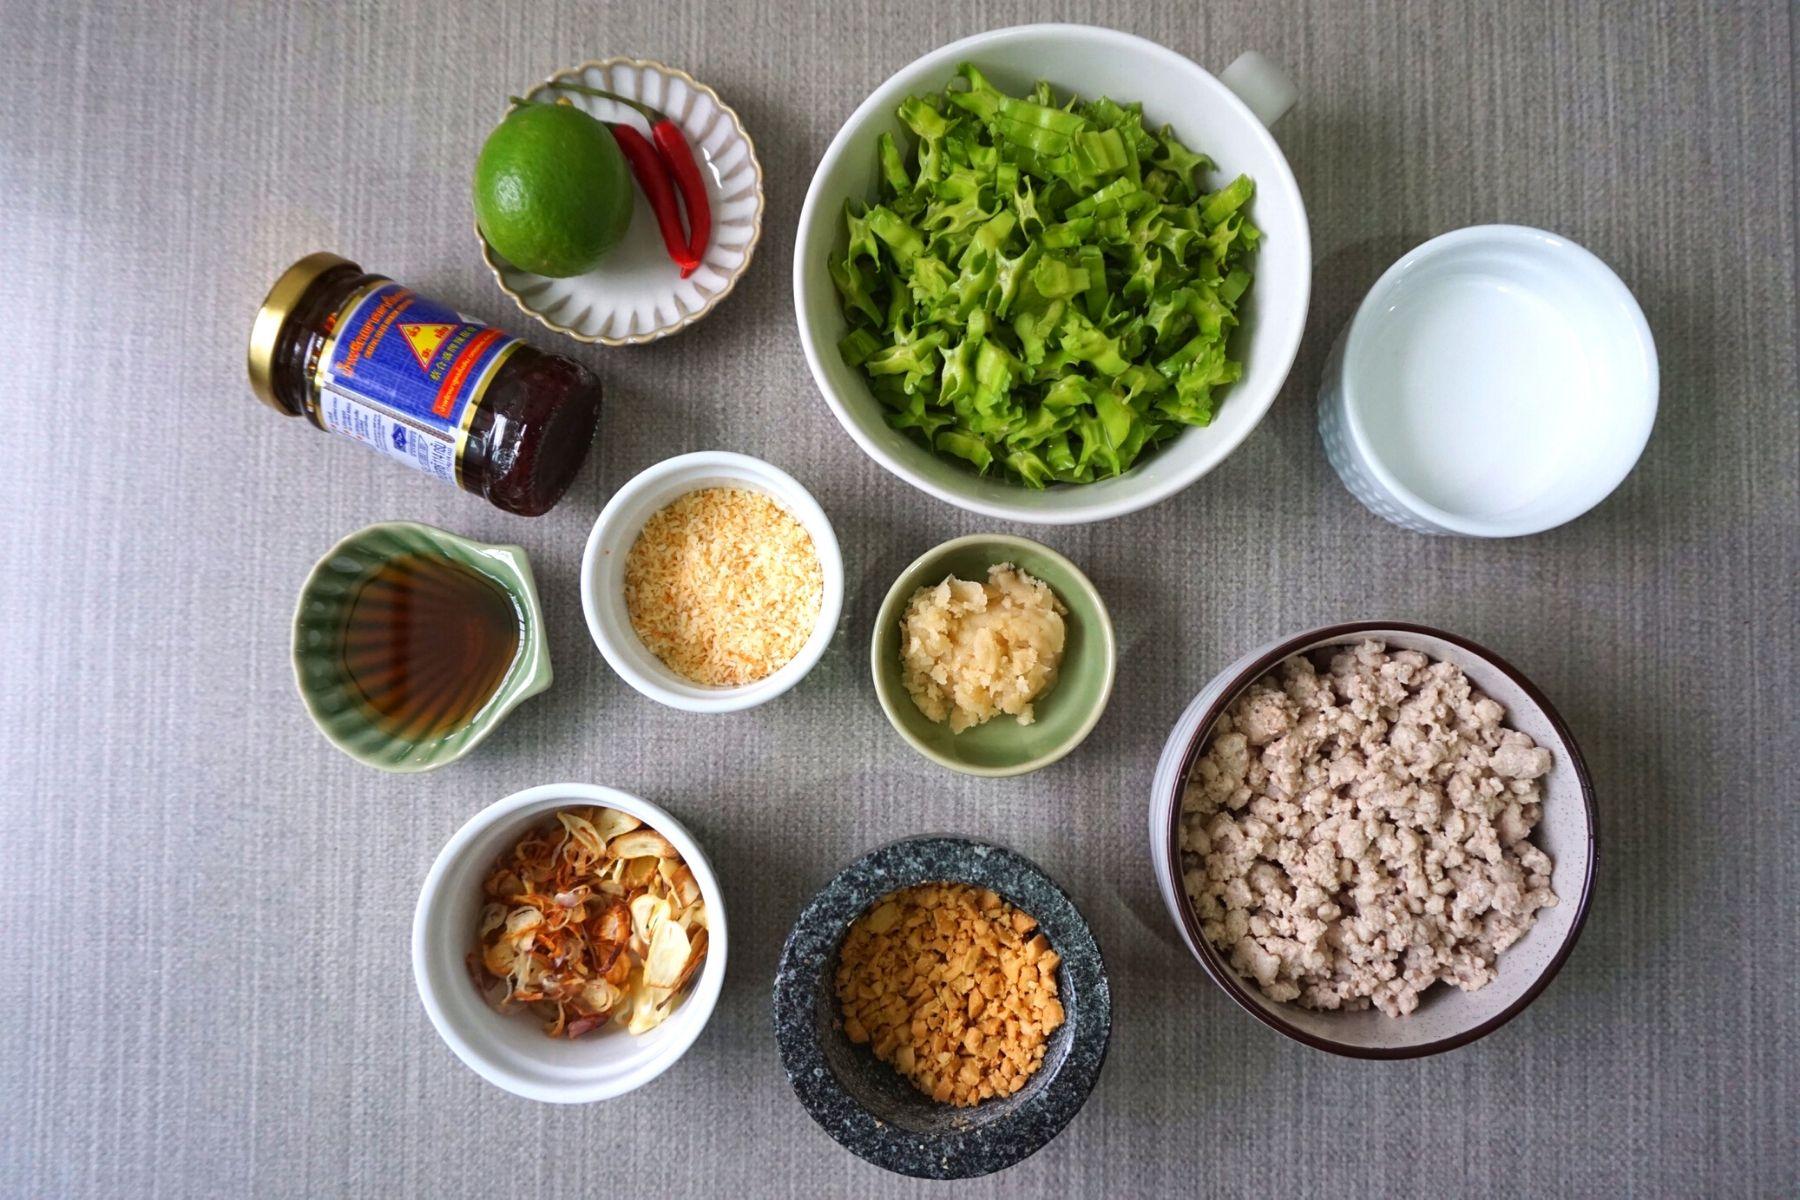 HappyFresh_Winged_Bean_Salad_With_Minced_Pork_Ingredients